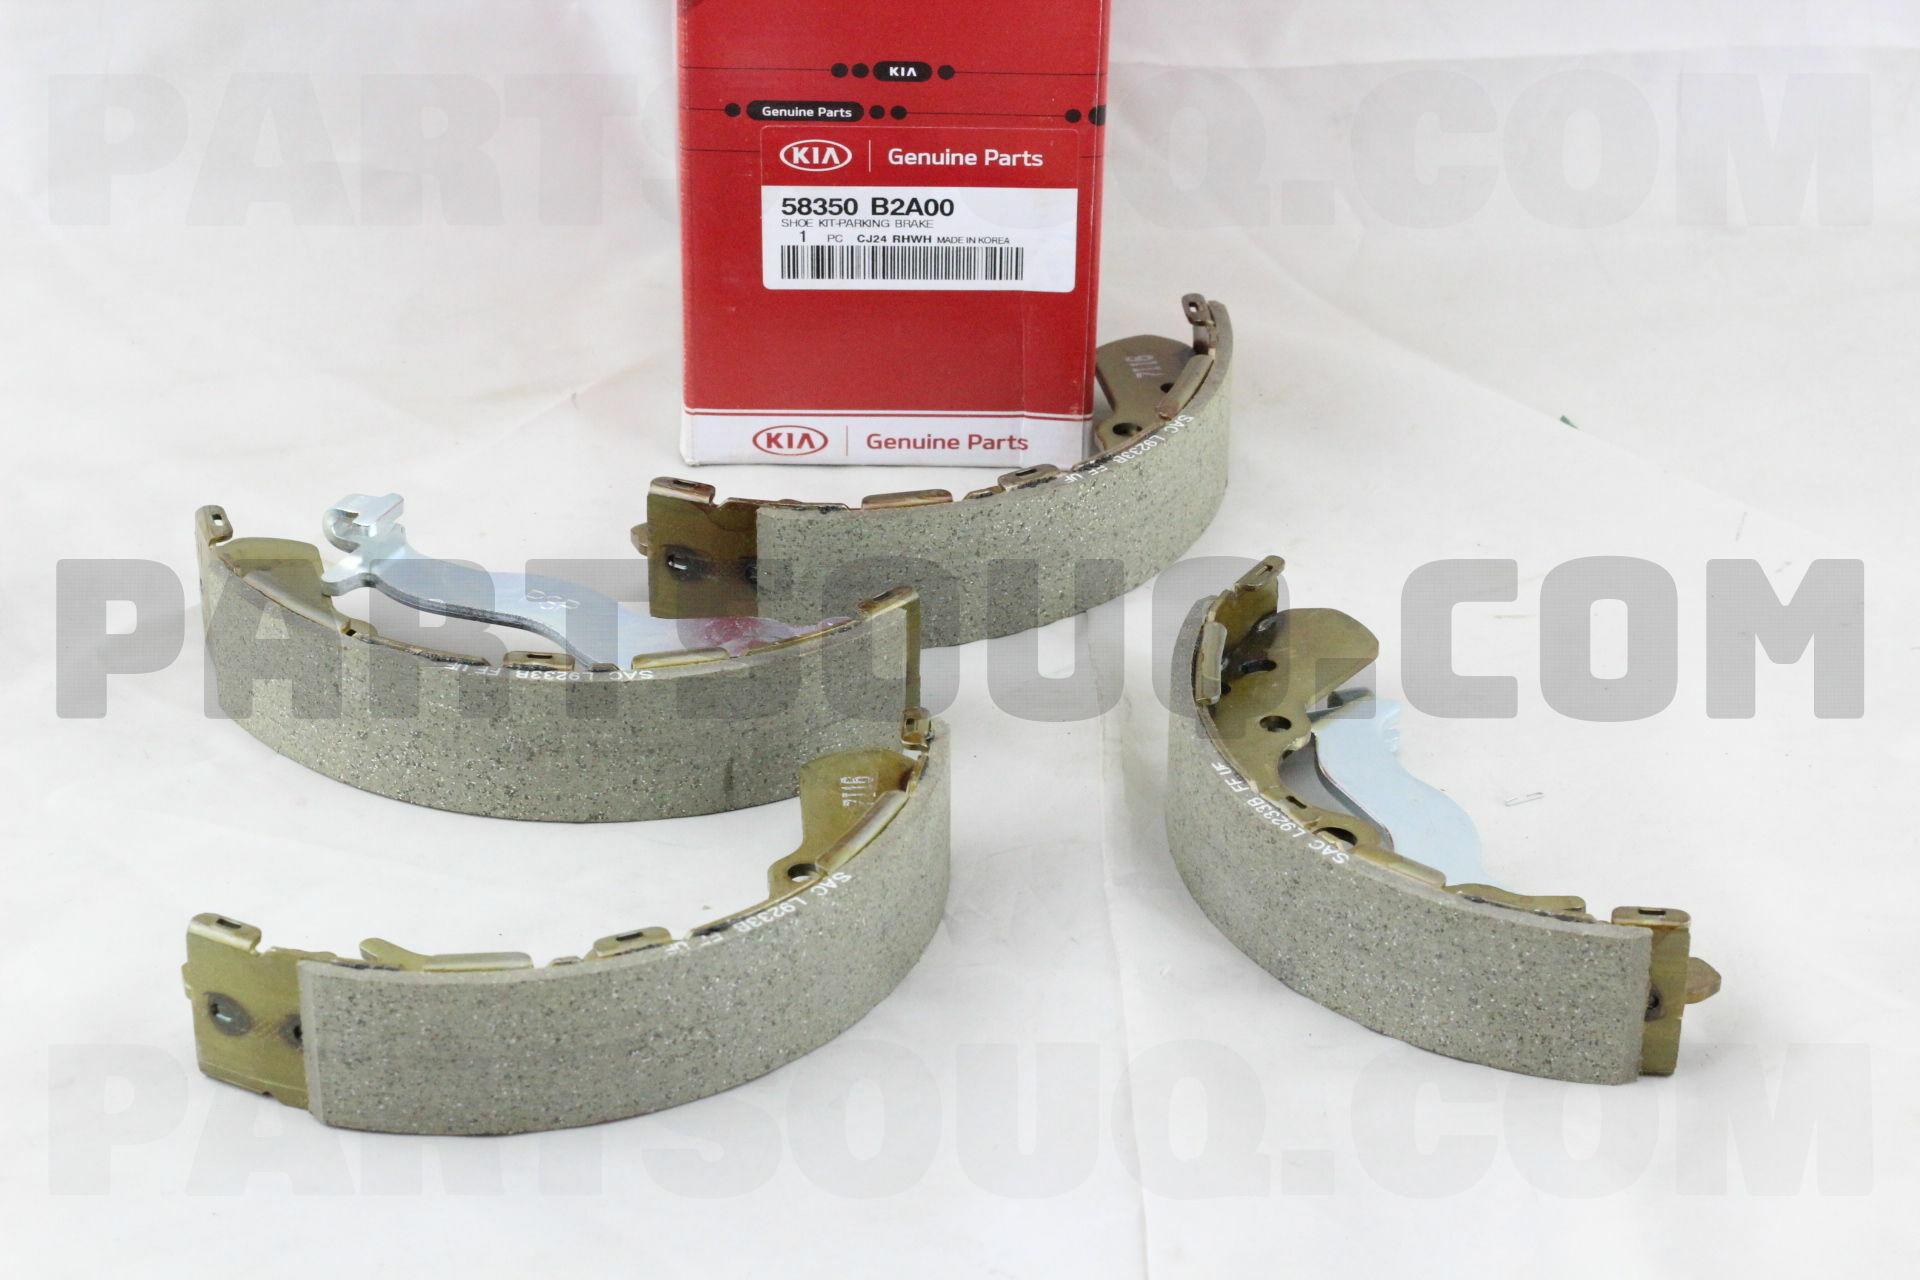 58350B2A00 Hyundai / KIA SHOE KIT-PARKING BRAKE Price: 58 33